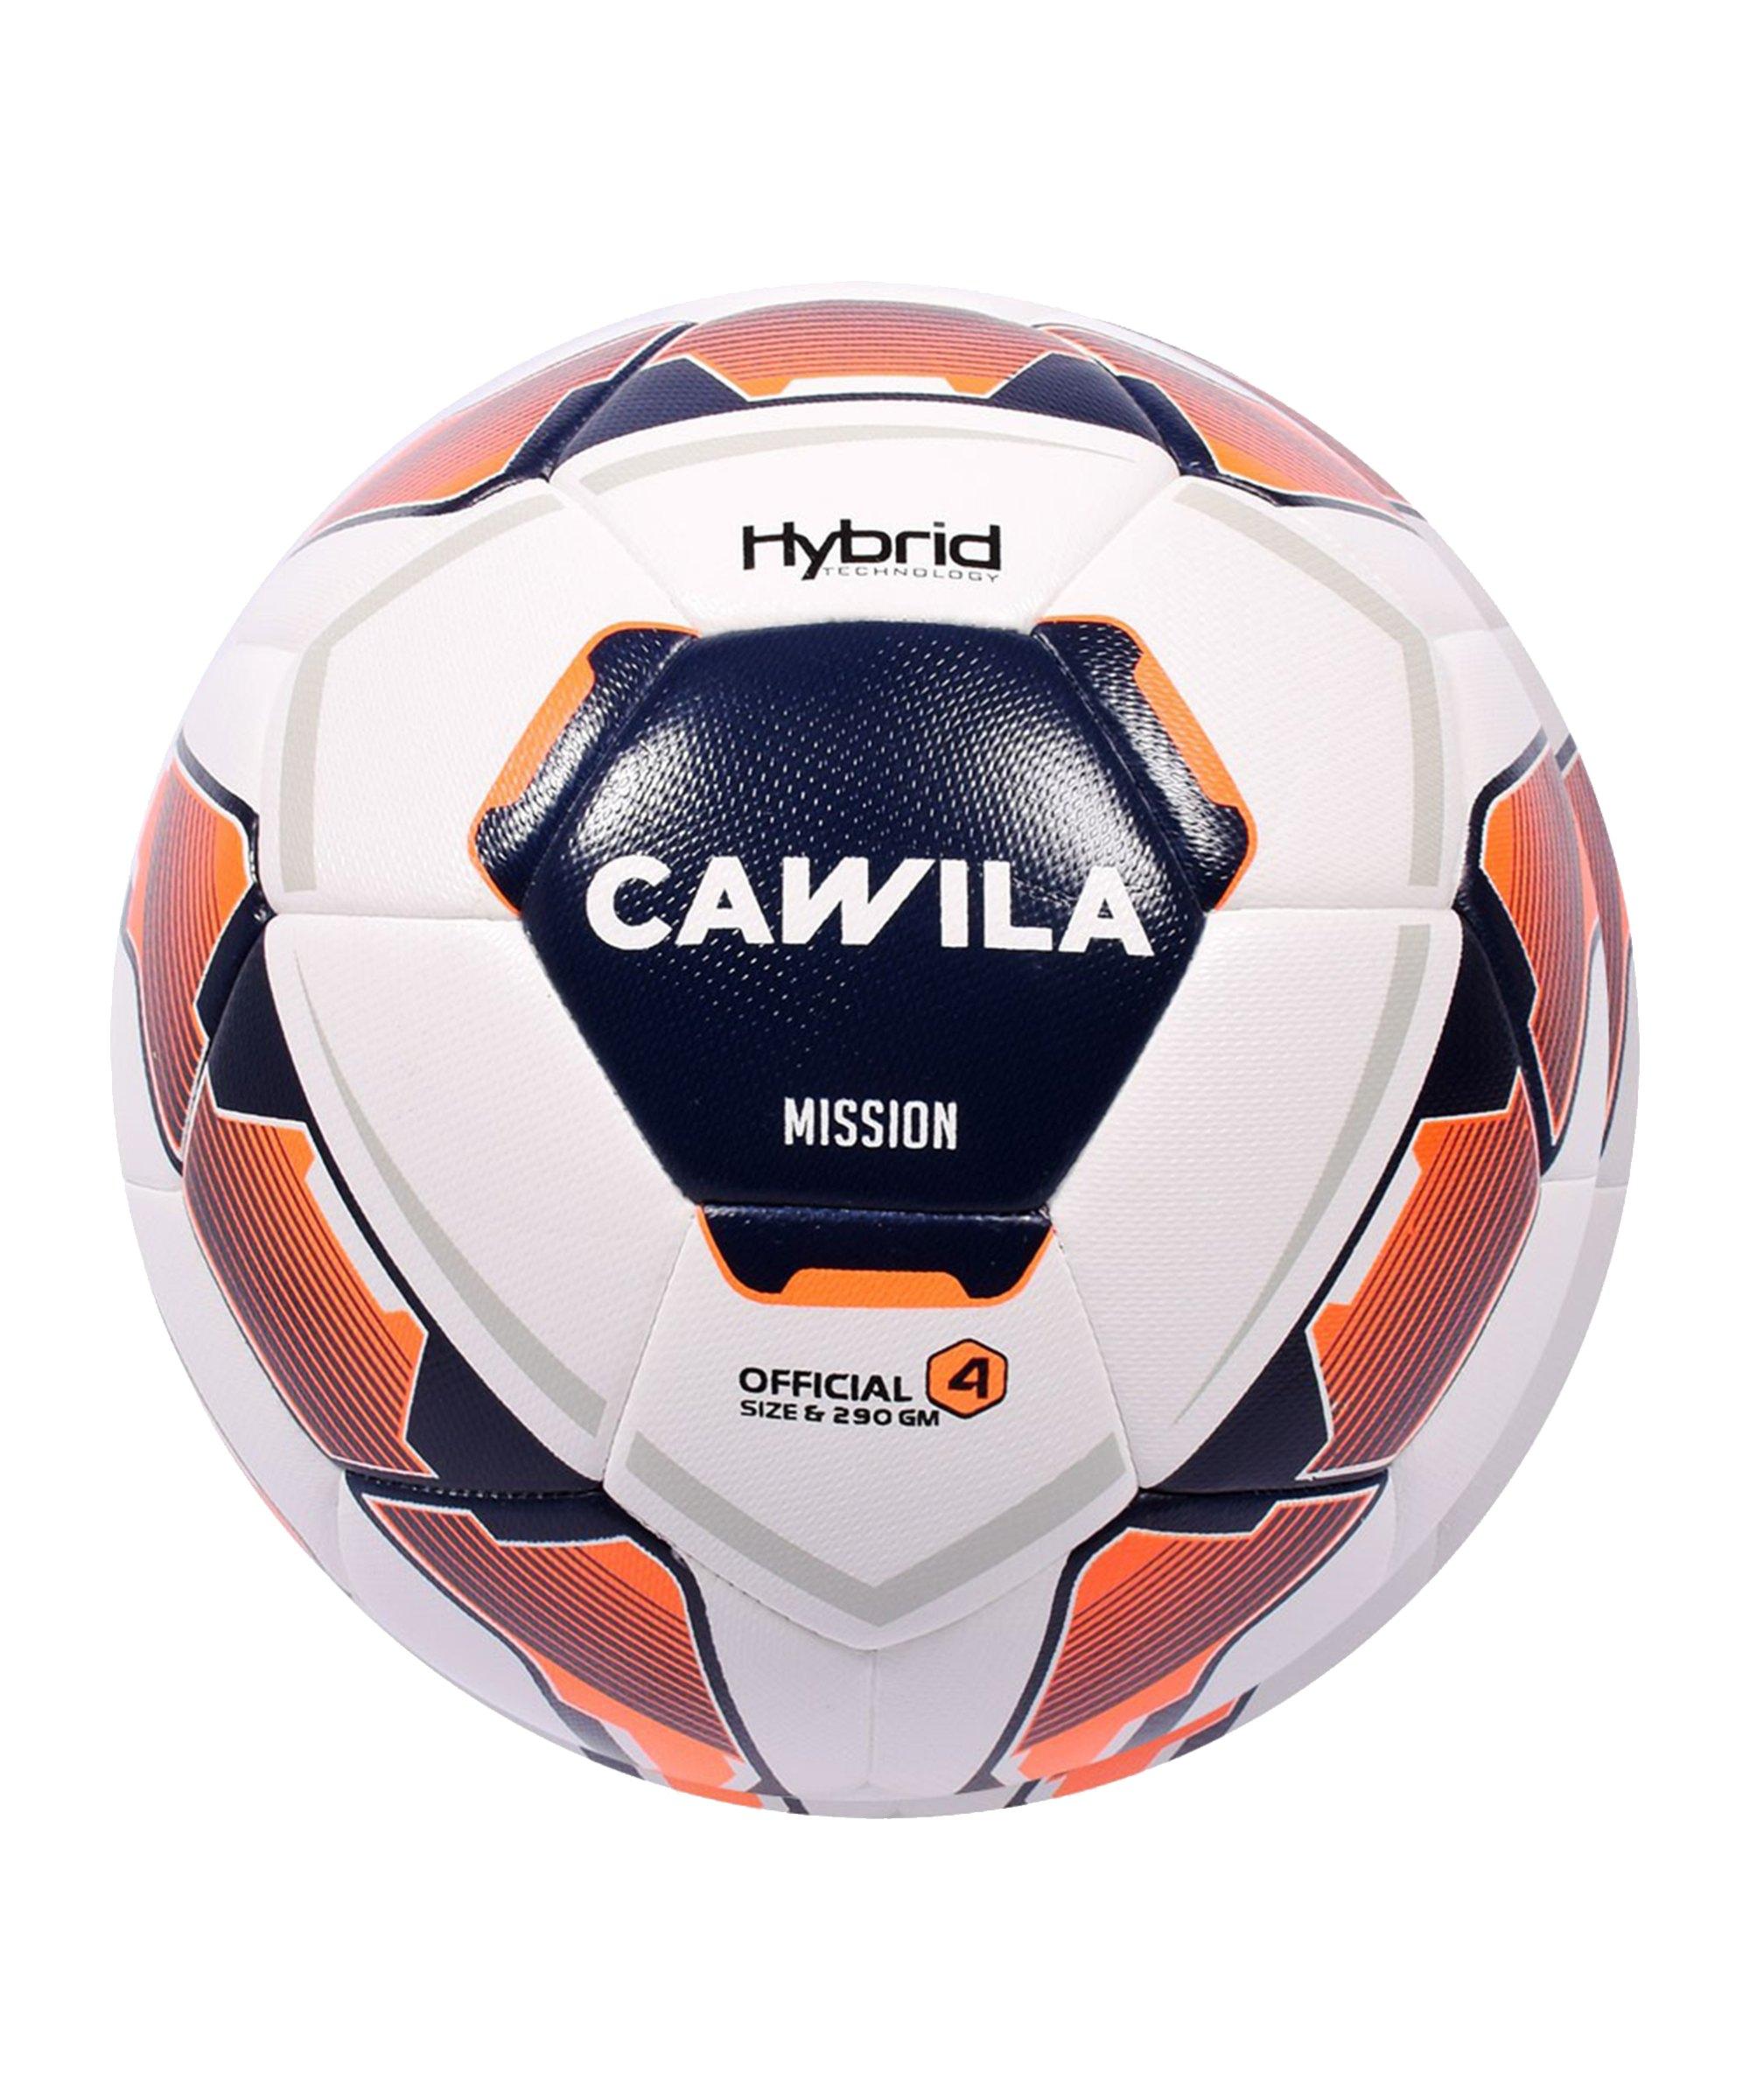 Cawila Fussball MISSION HYBRID X-LITE 290 290g 4 - weiss